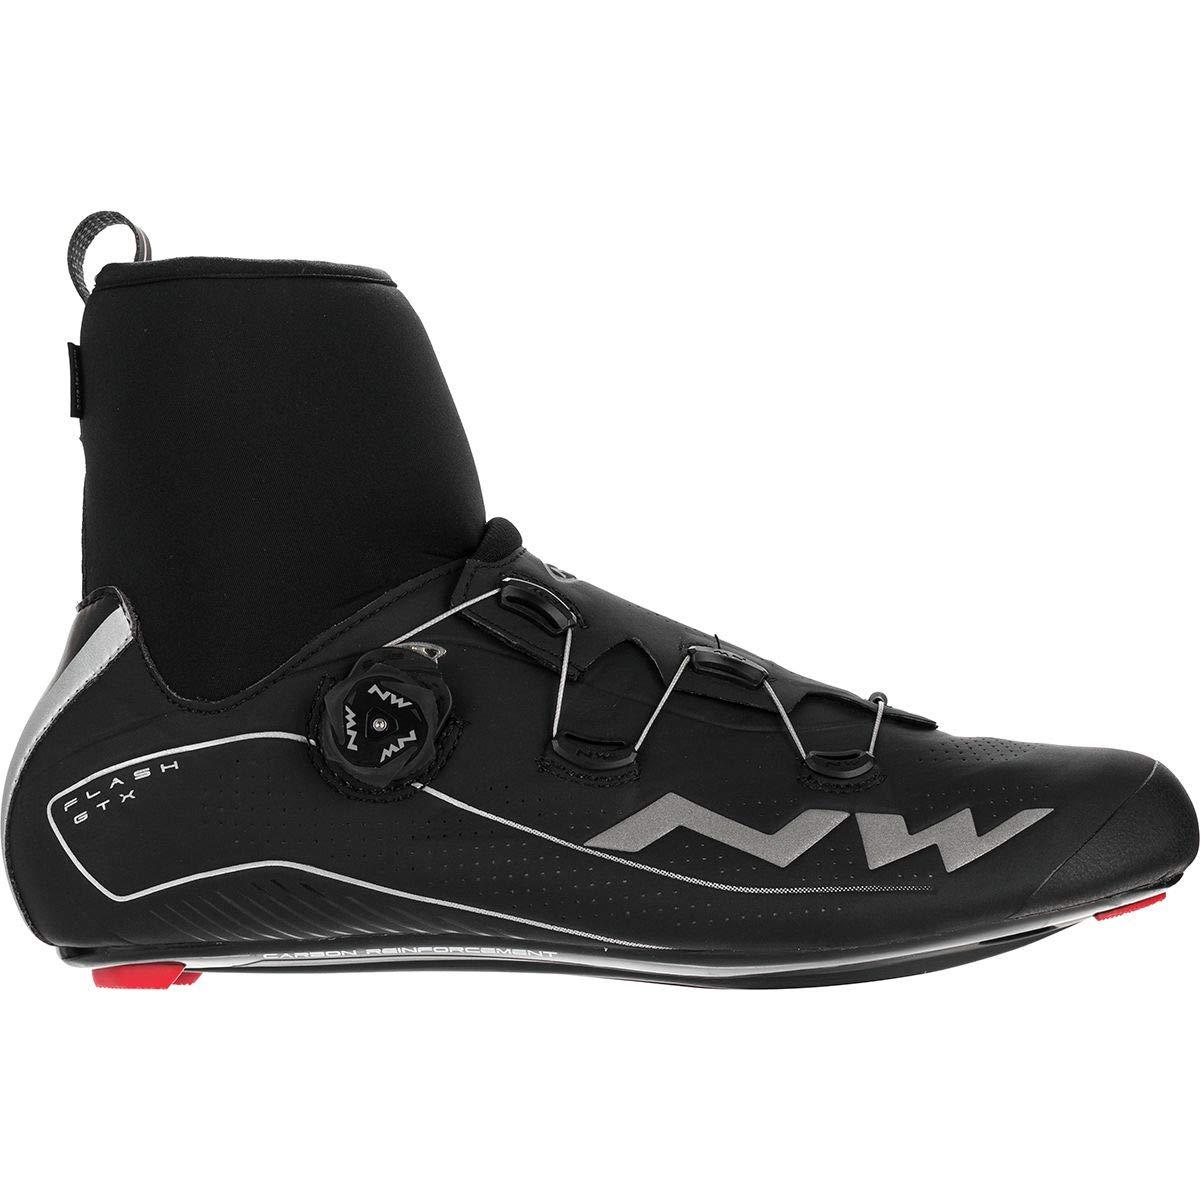 NORTHWAVE メンズ ロードサイクリングシューズ FLASH GTX ブラック 46 EU  B06Y5MJ691